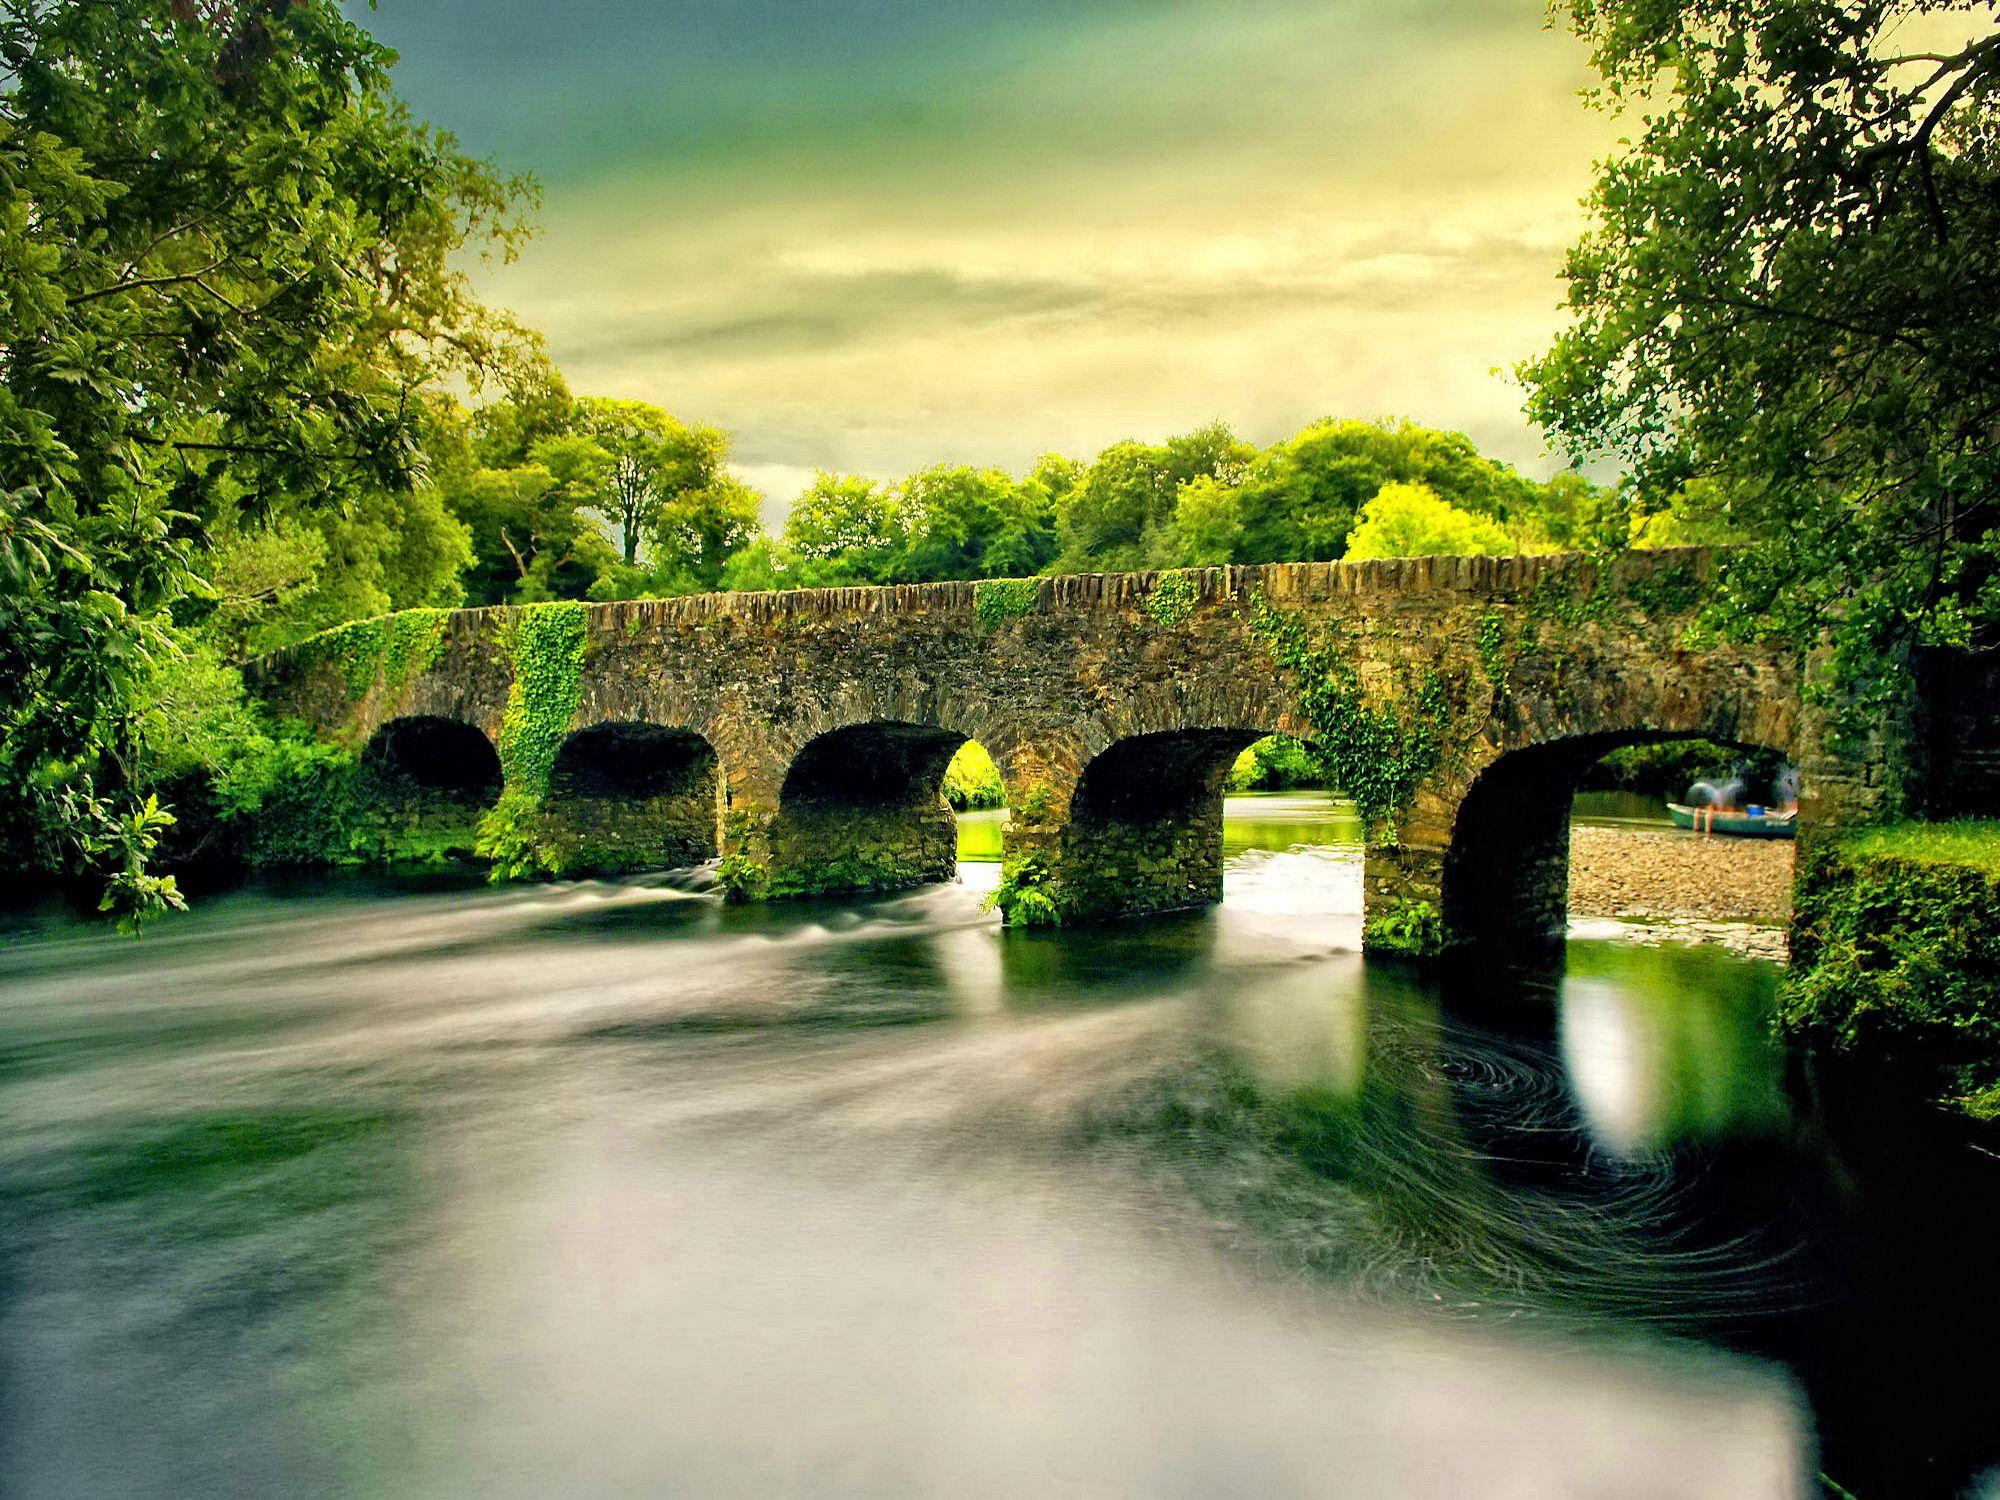 Hd Wallpapers Butterflies Widescreen Hd Zen Wallpapers Y9350 Ireland County Kerry Stone